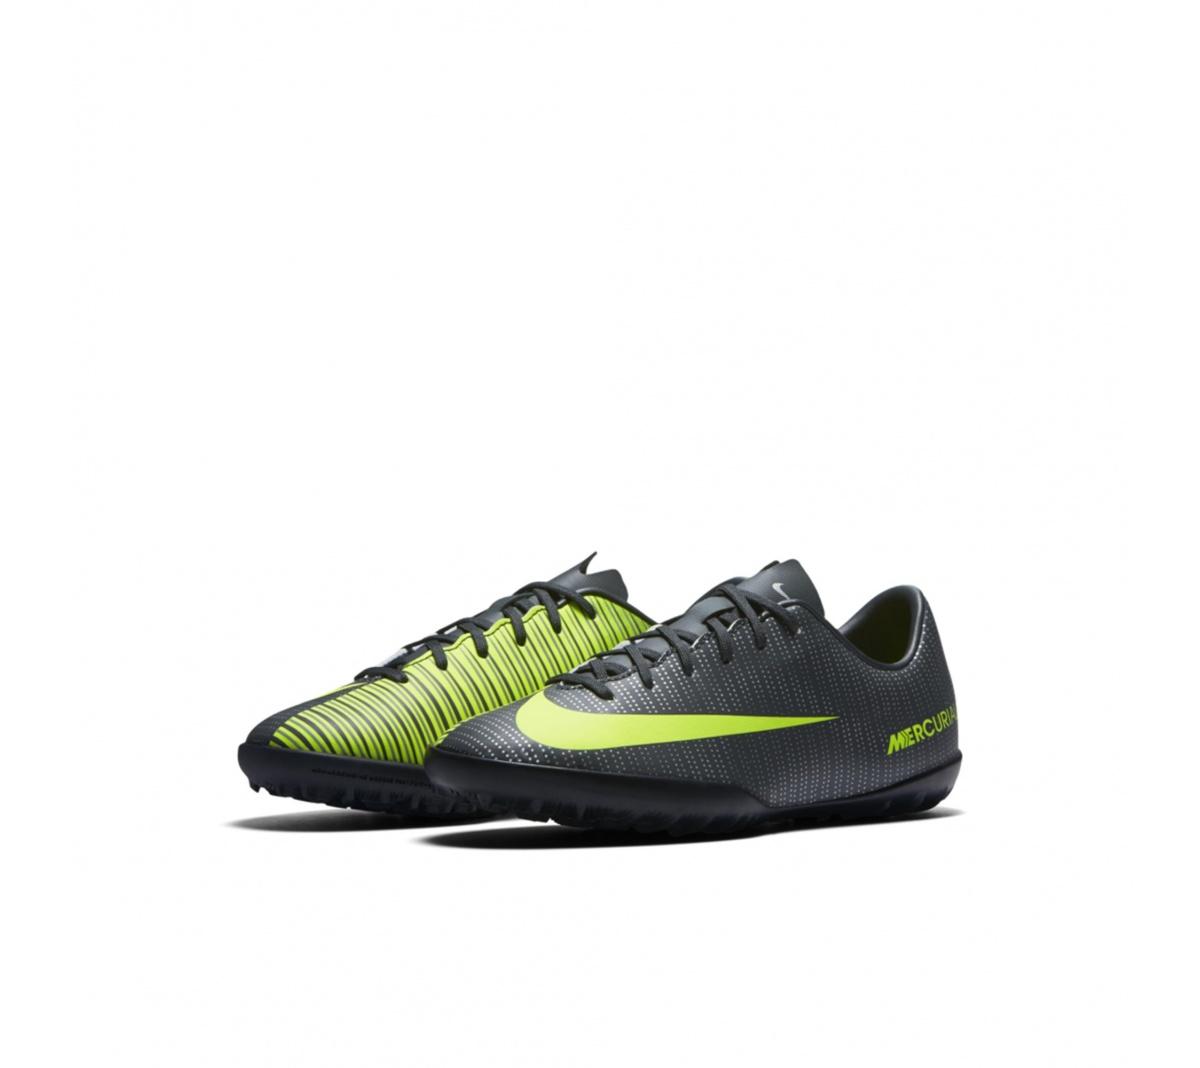 Chuteira Nike MercurialX Vapor 6 CR7 Society Infantil